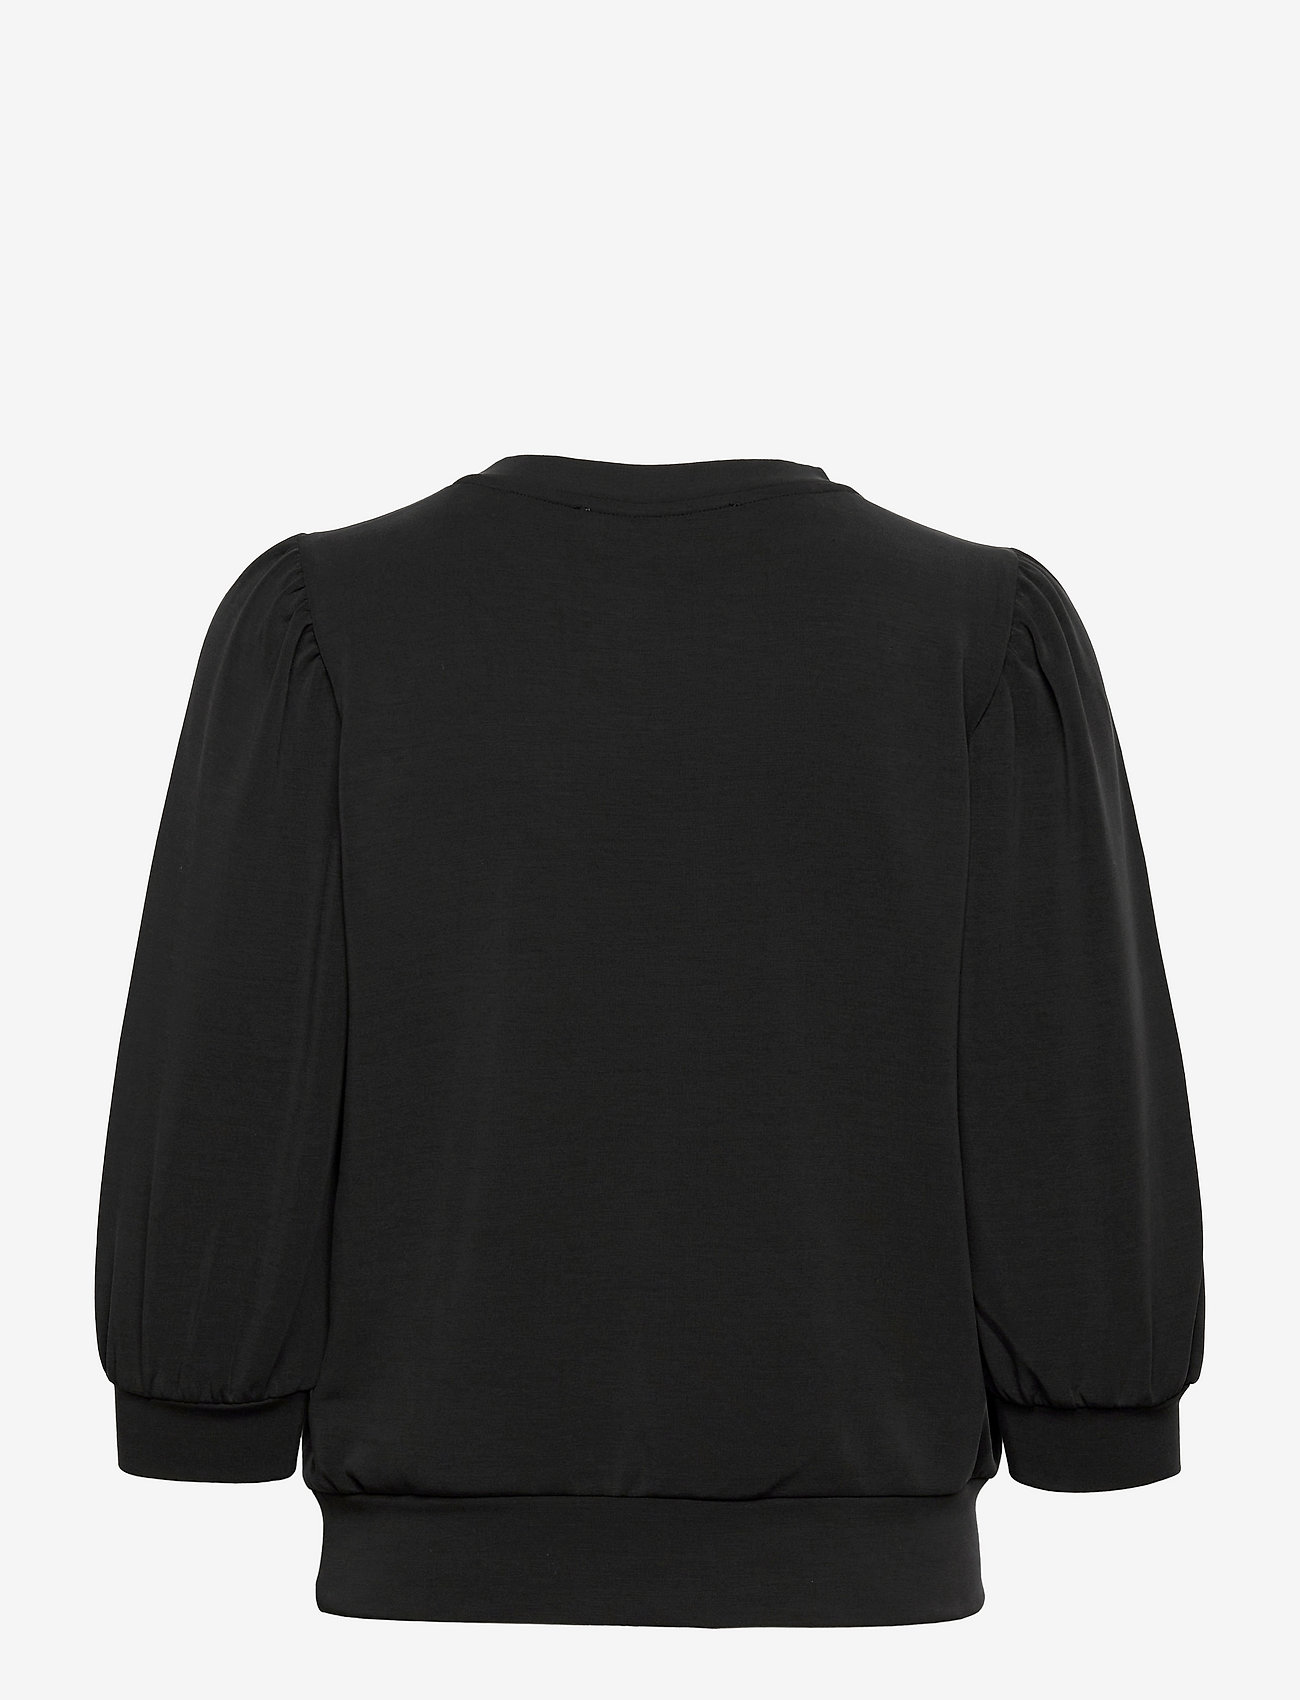 Selected Femme - SLFTENNY 3/4 SWEAT TOP - sweatshirts - black - 1